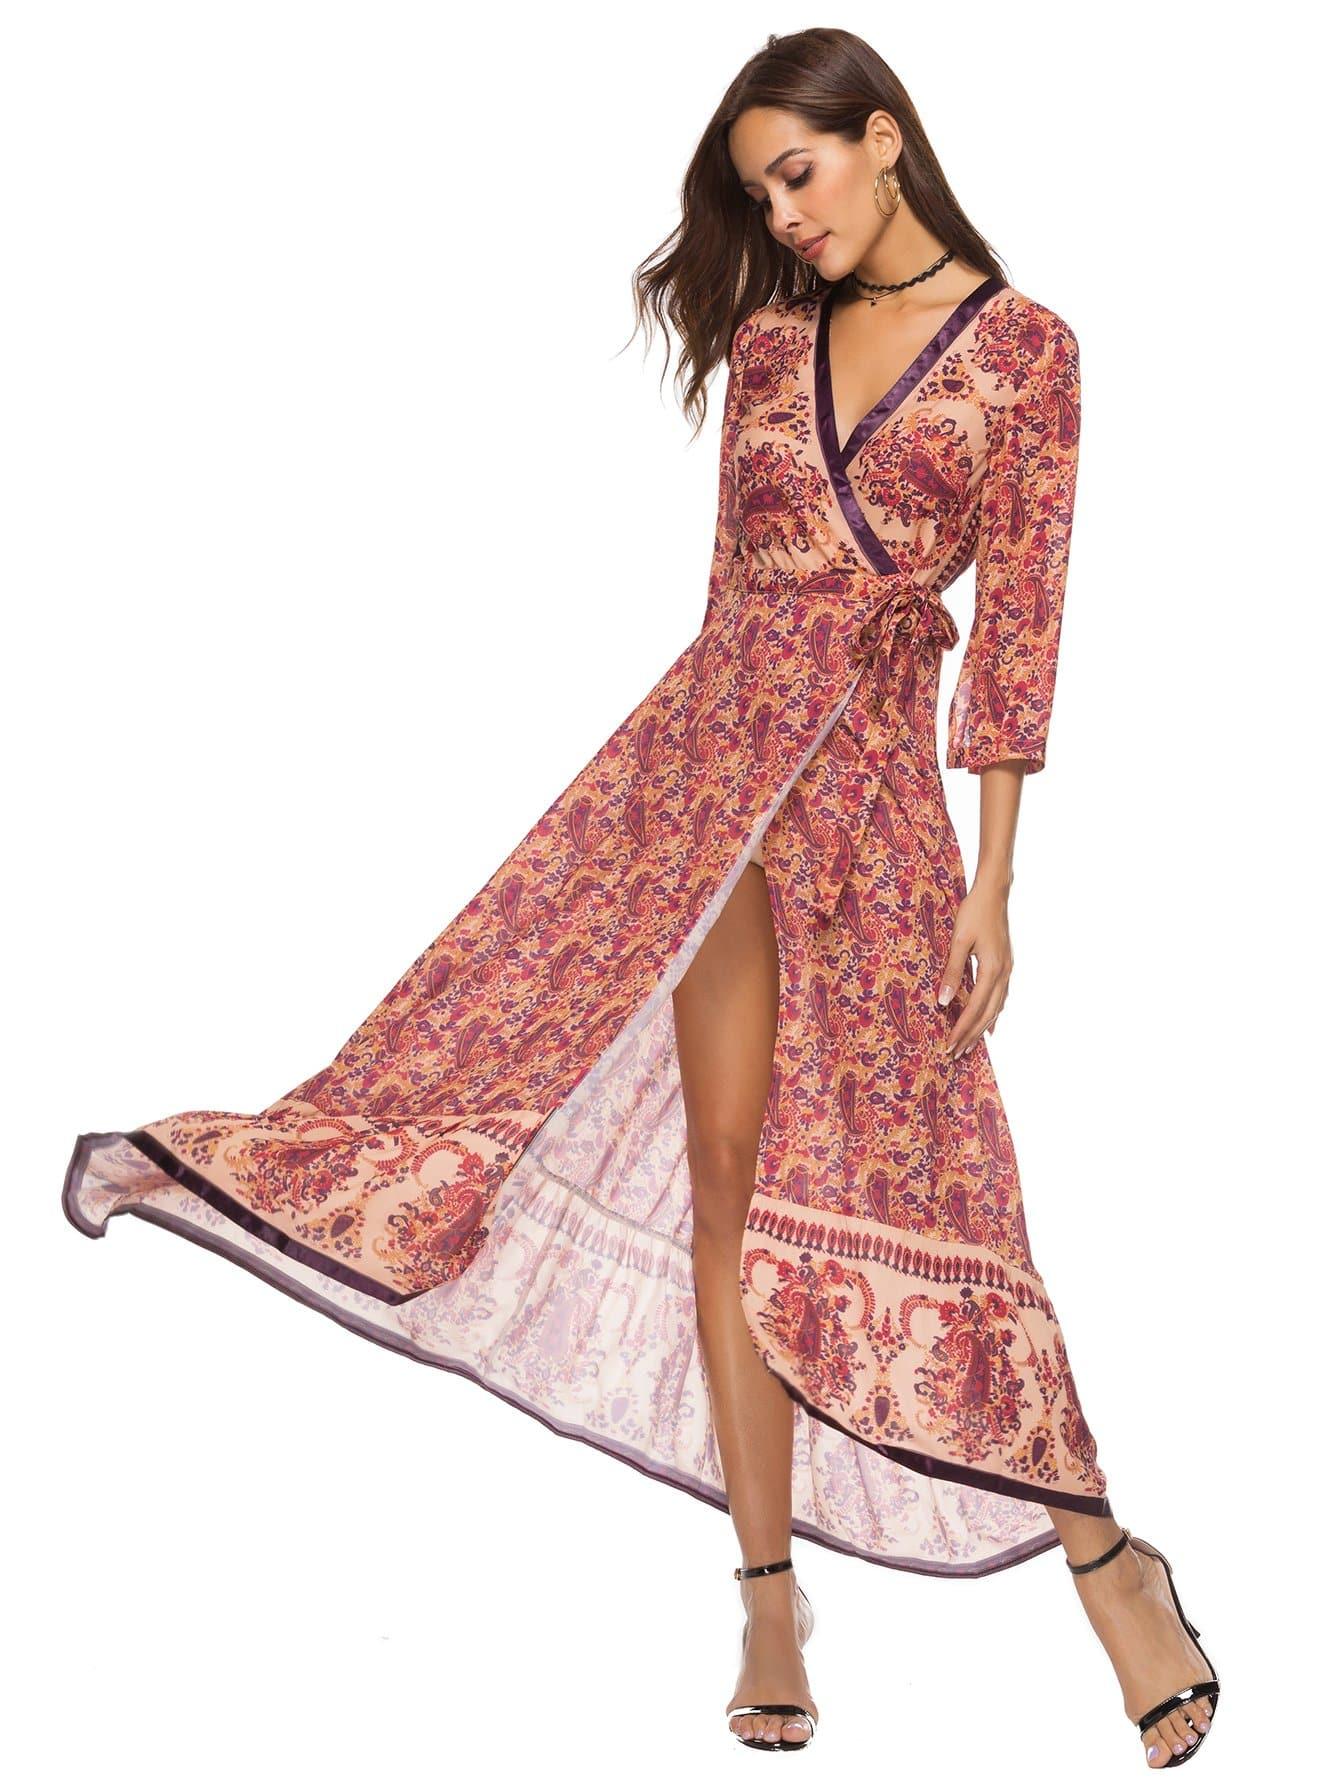 Knot Side Paisley Print Dress guitar print knot side dress